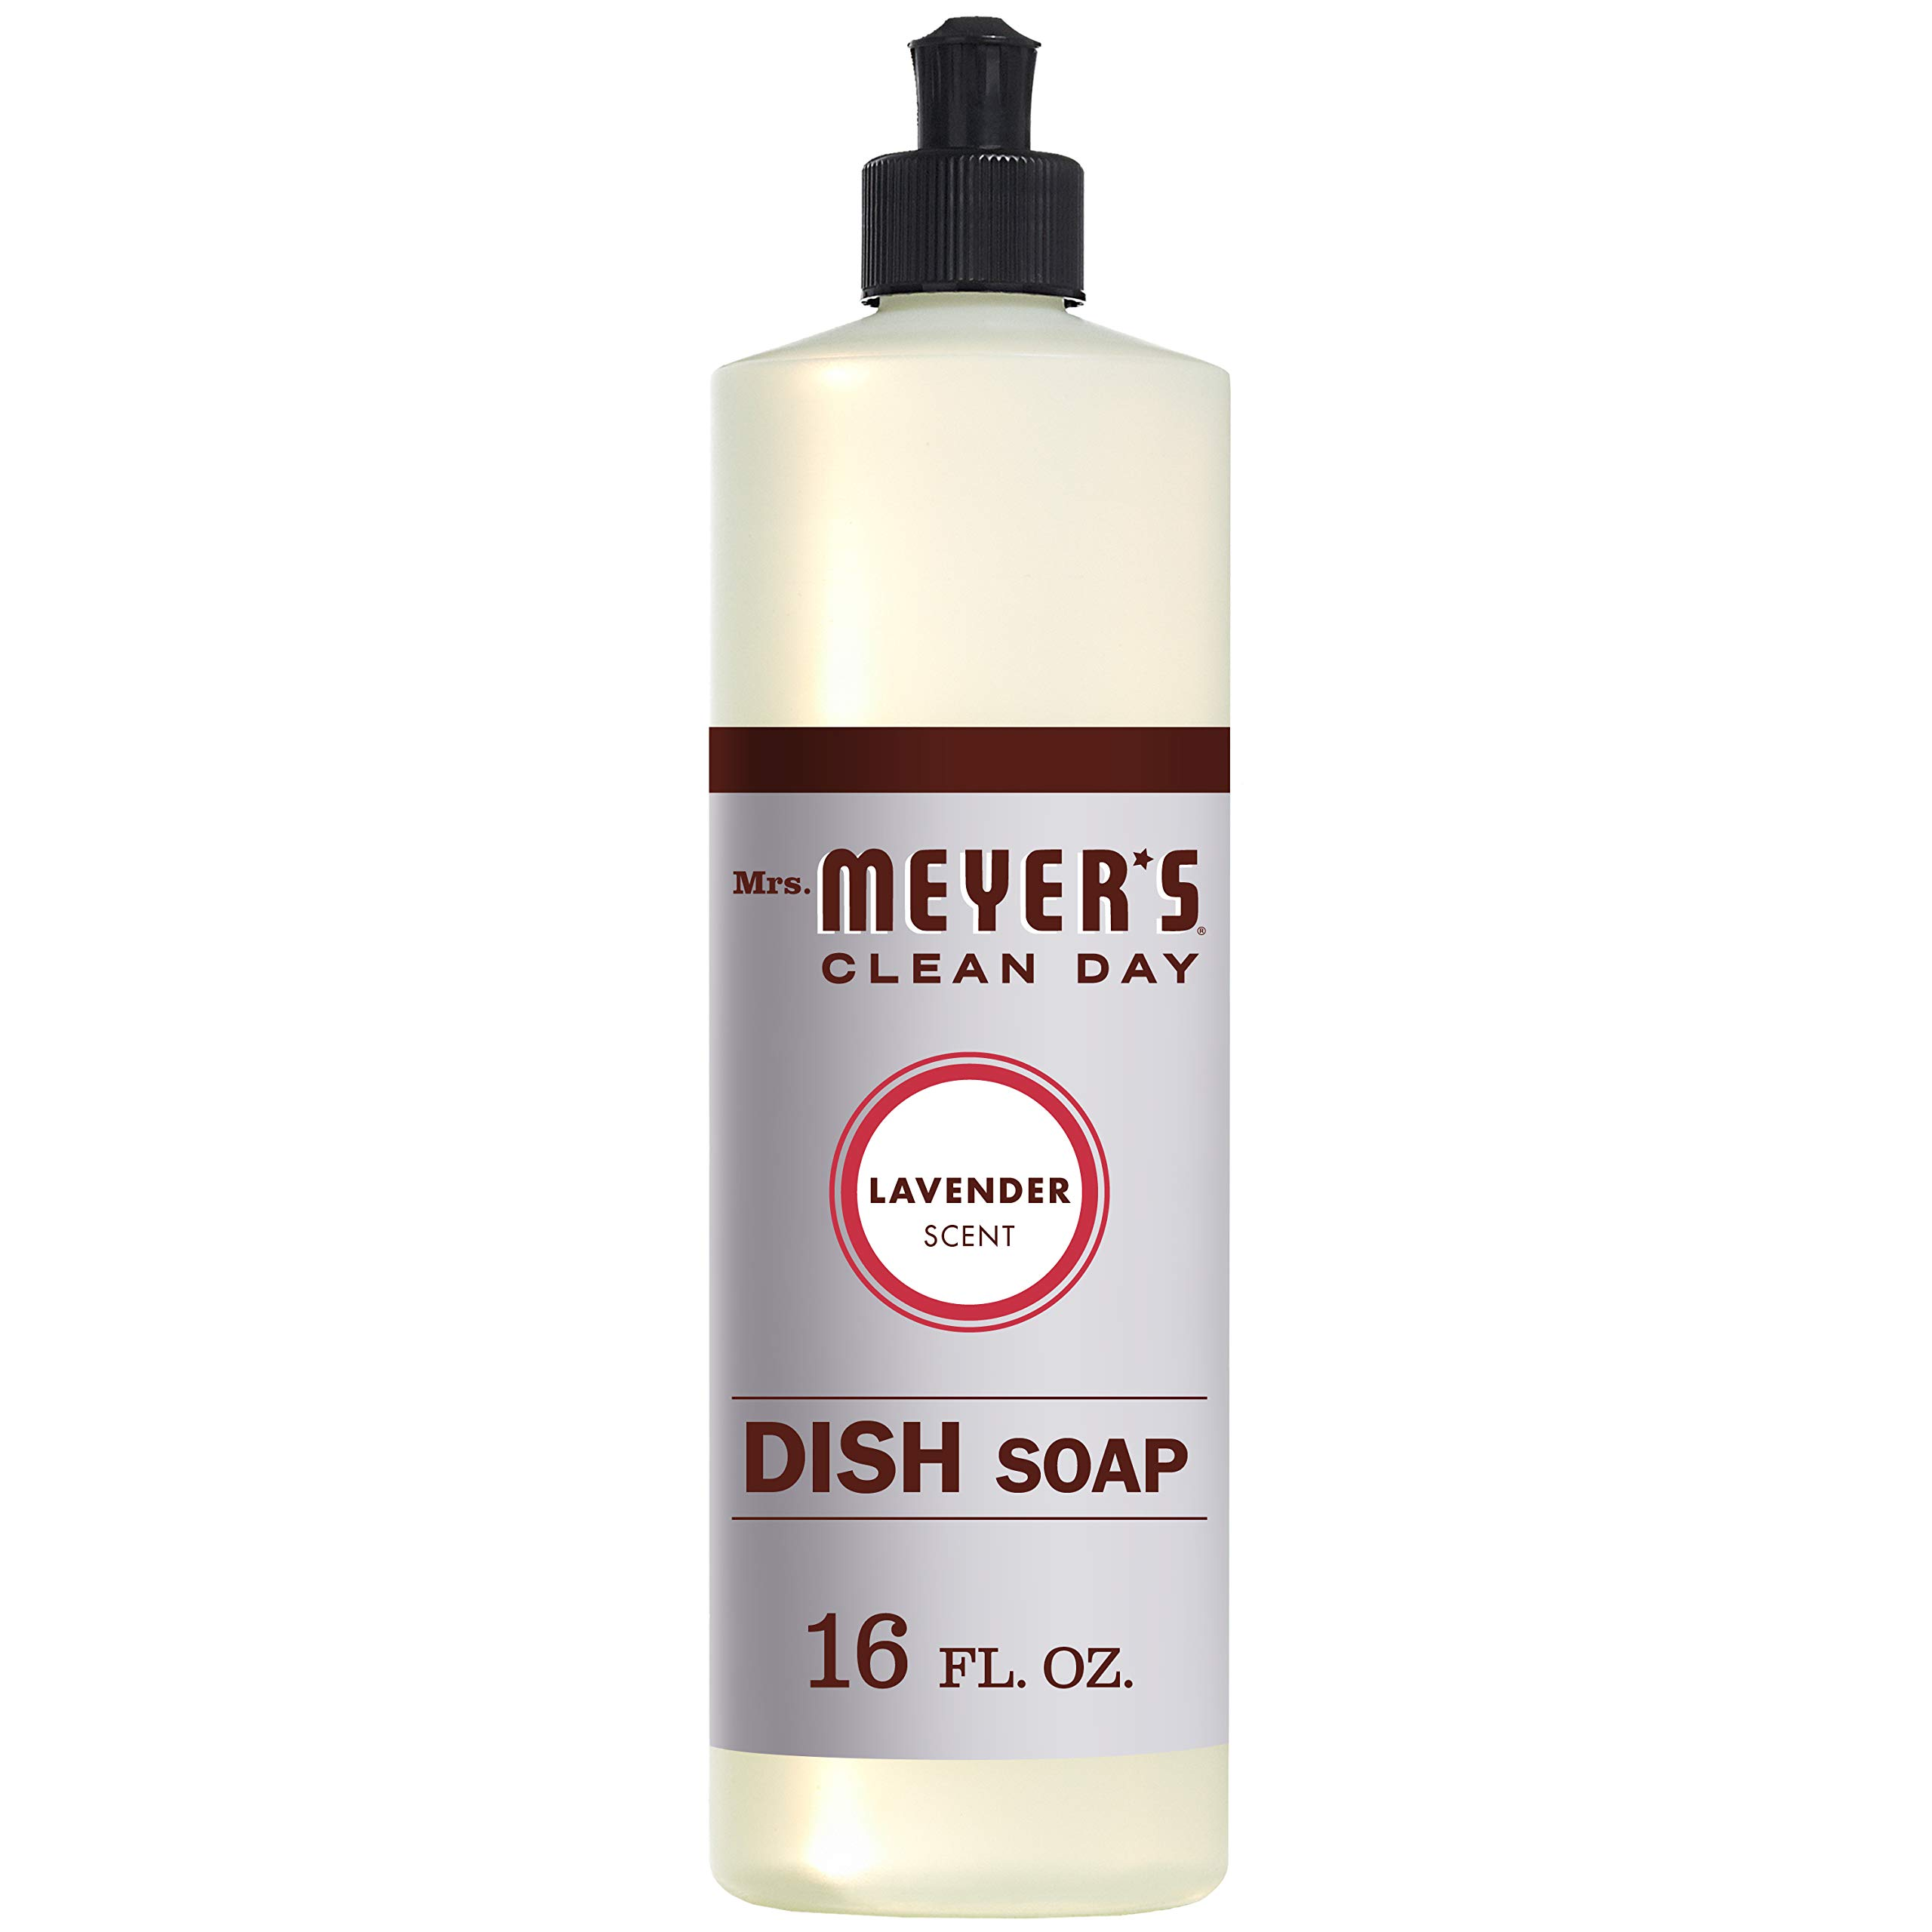 Mrs. Meyer's Clean Day 765180 Liquid Dish Soap Lavender